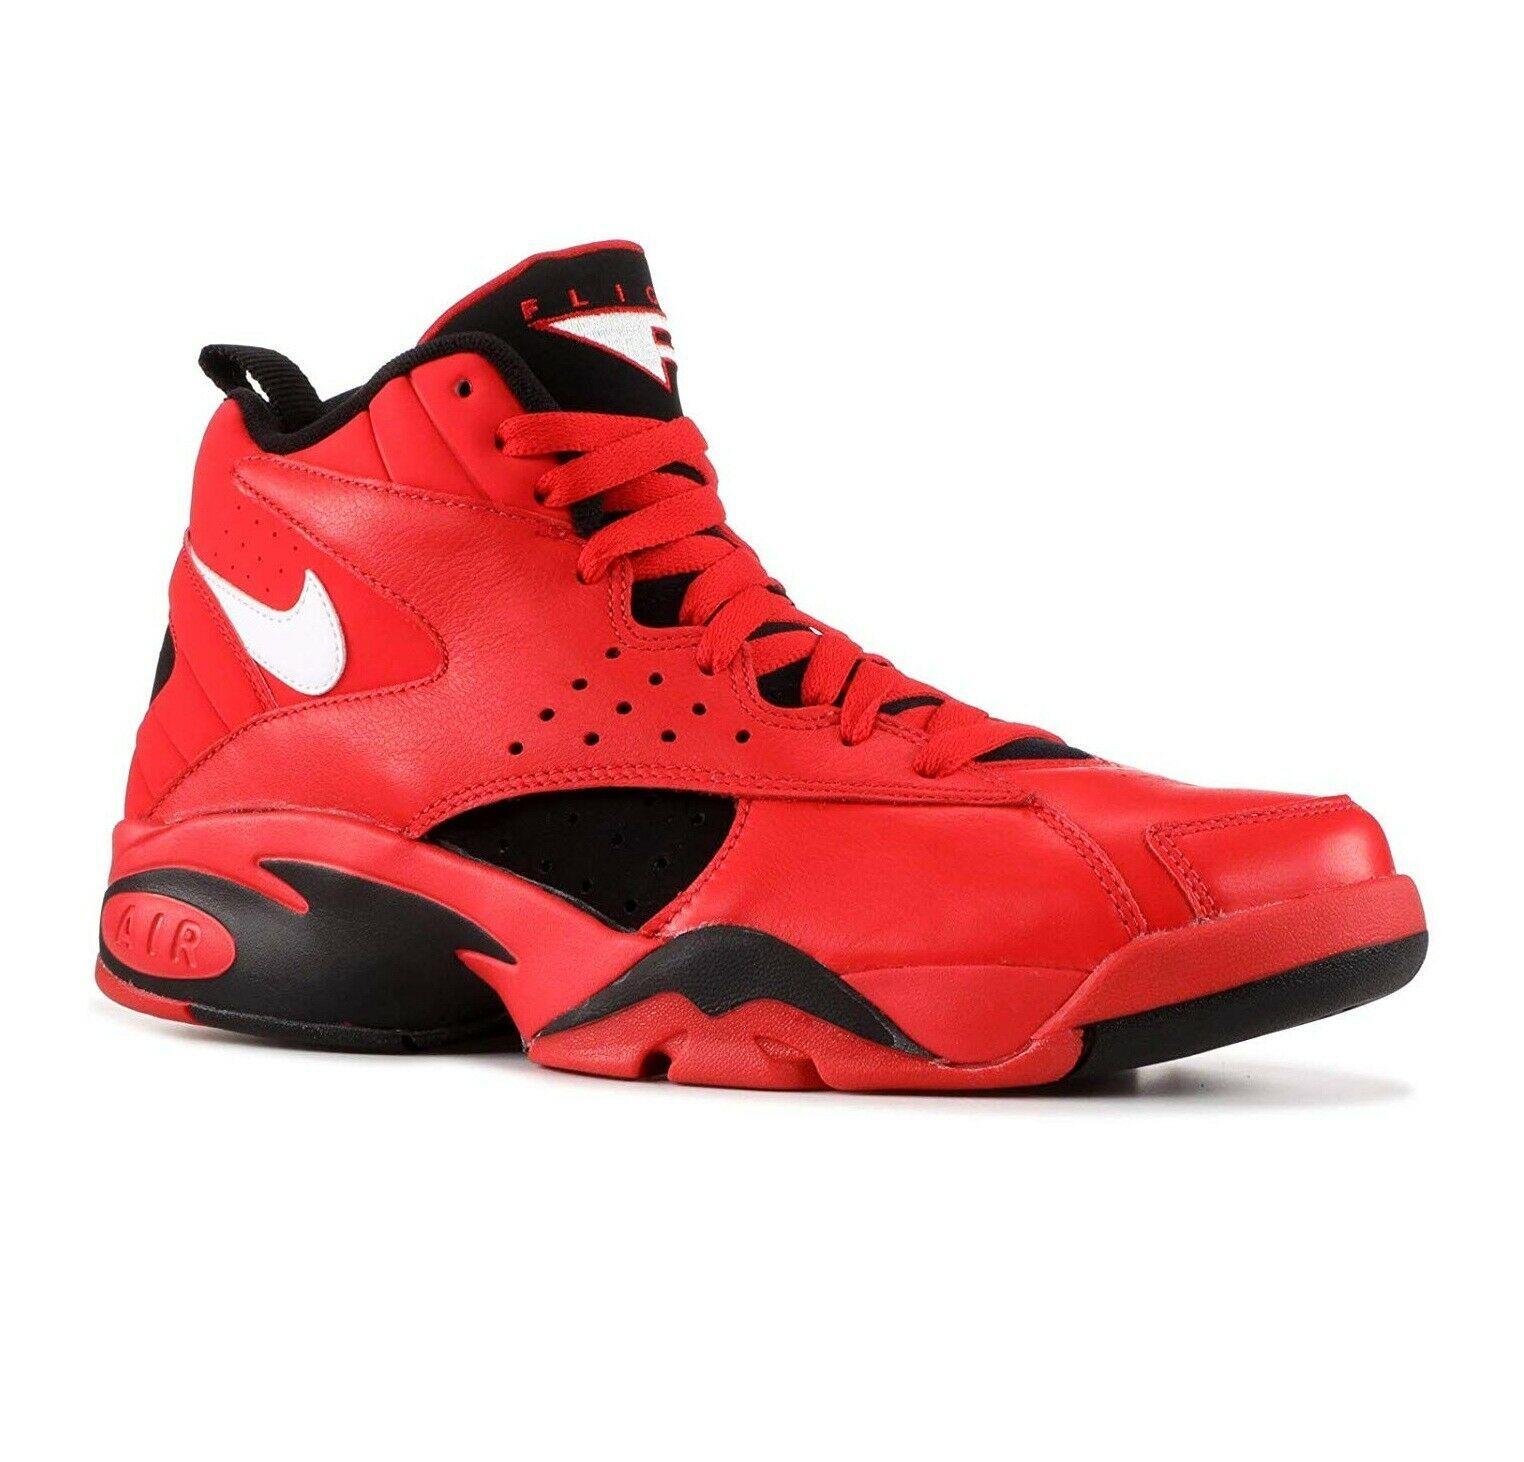 new product a2a55 331e1 Nike Air Maestro II QS Red Black Pippen Trifecta AJ9281-600 Mens Size 10.5  -  109.95